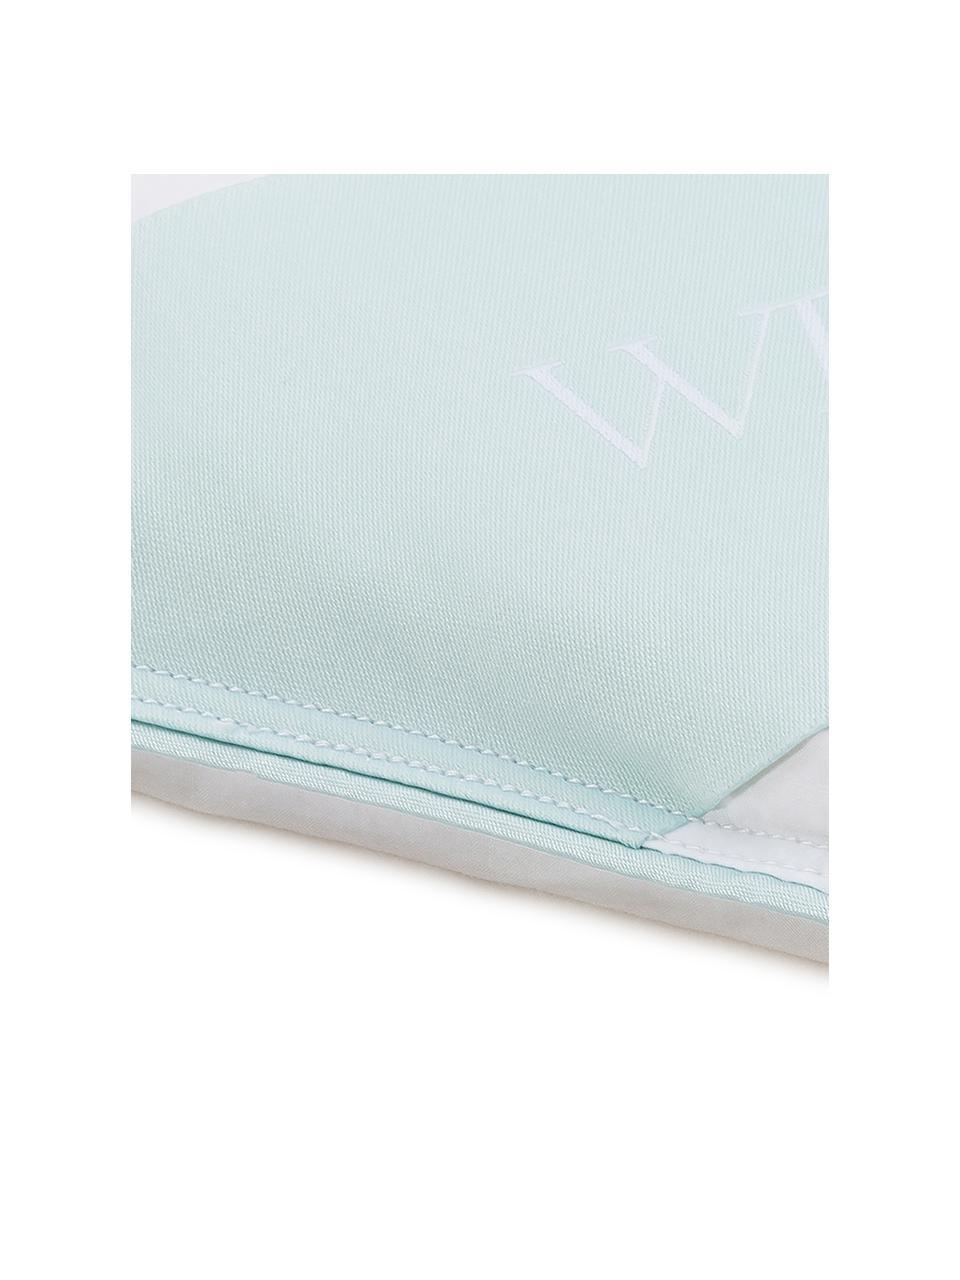 Donzen cassette-dekbed Comfort, licht, Wit, 135 x 200 cm